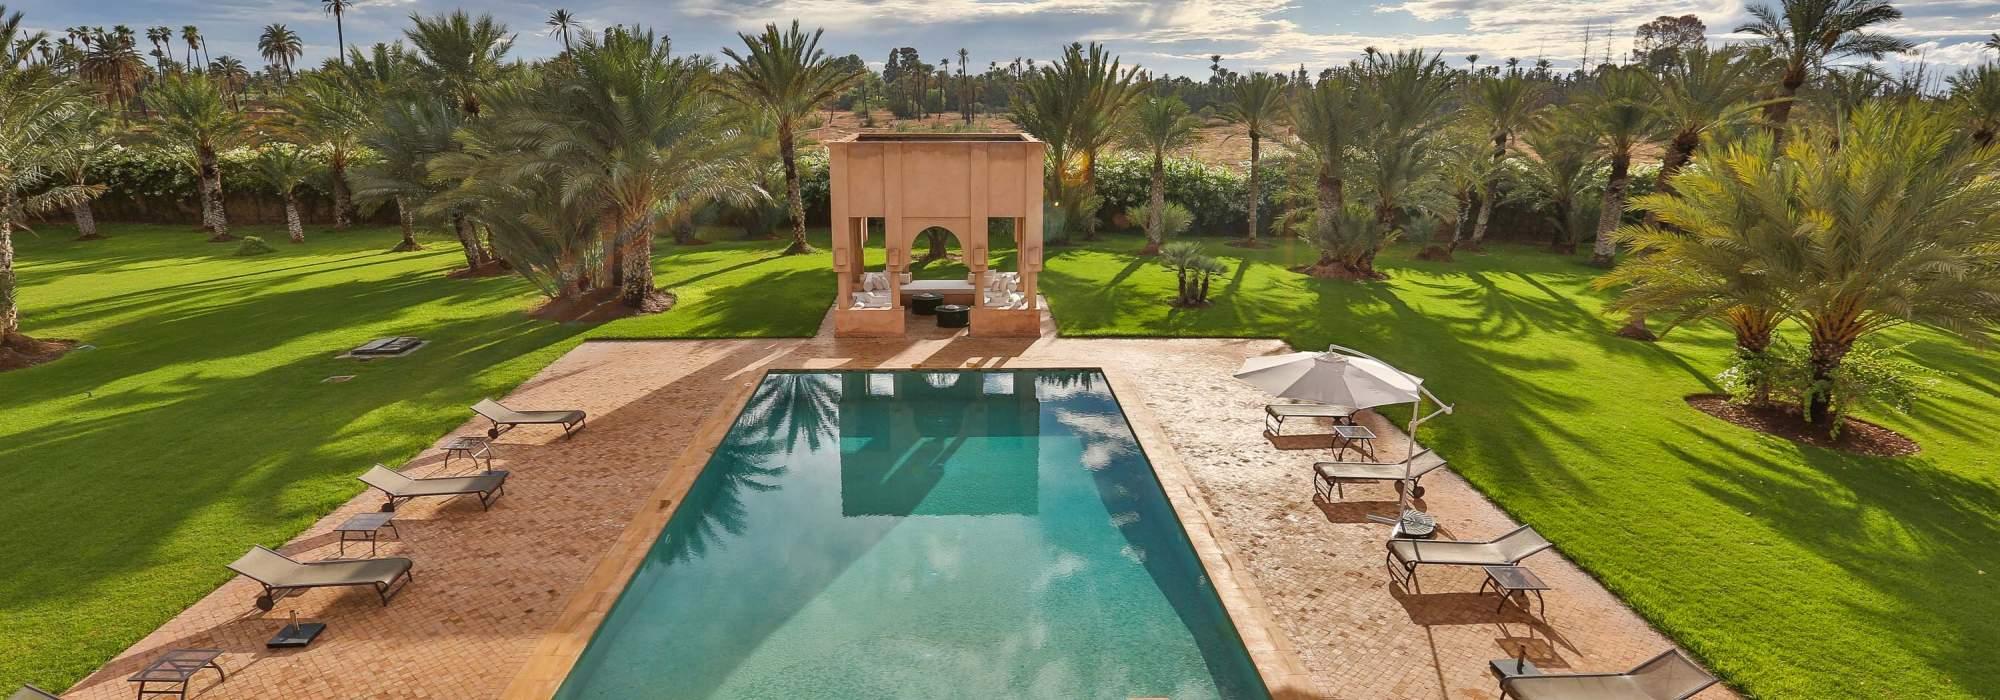 luxueuse villa a vendre a la palmeraie marrakech